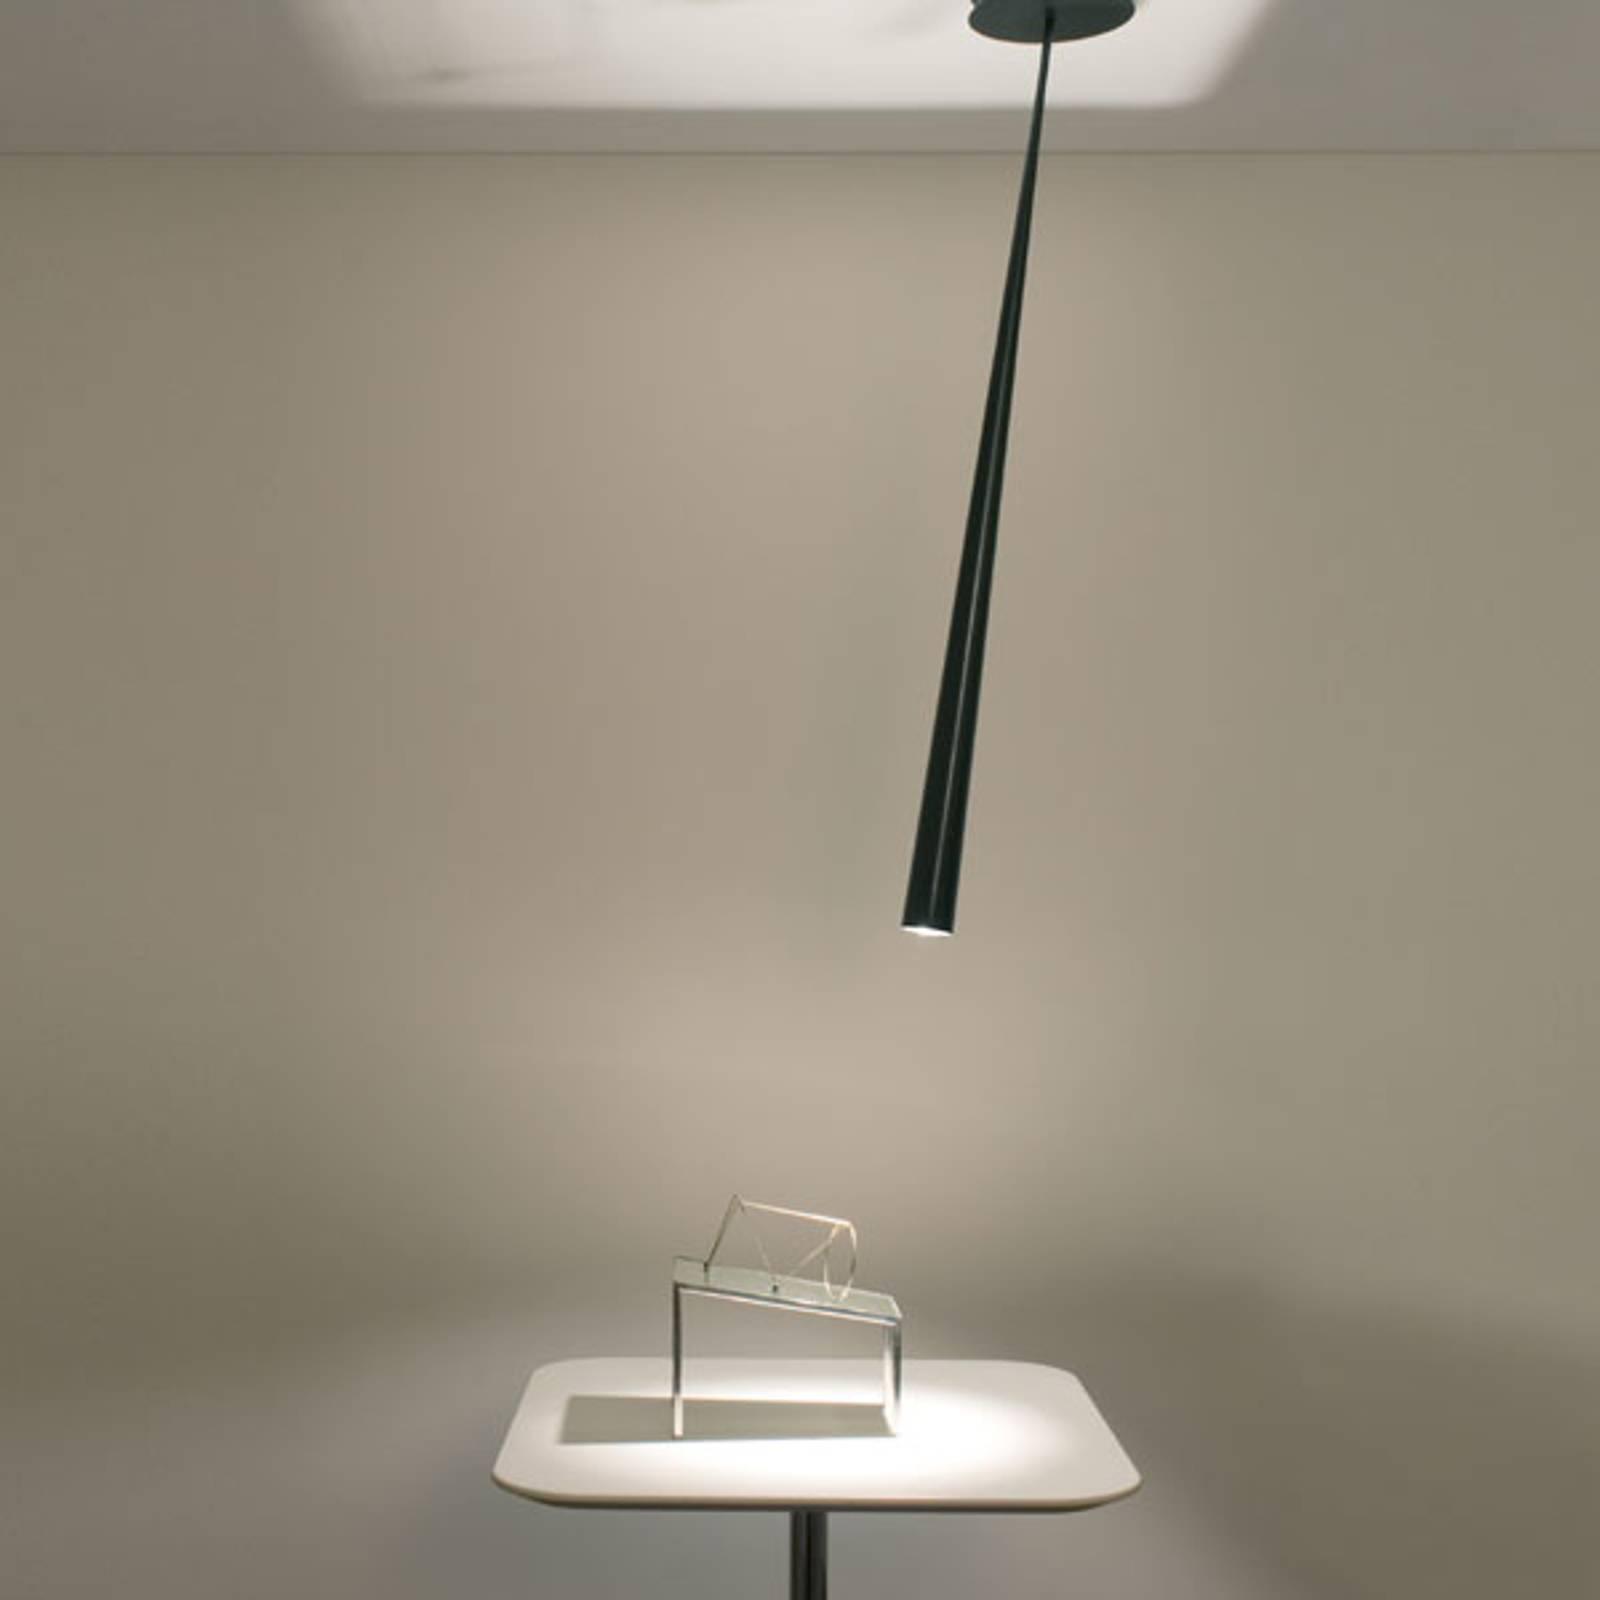 Designerska lampa wisząca Drink, czarna, 127 cm